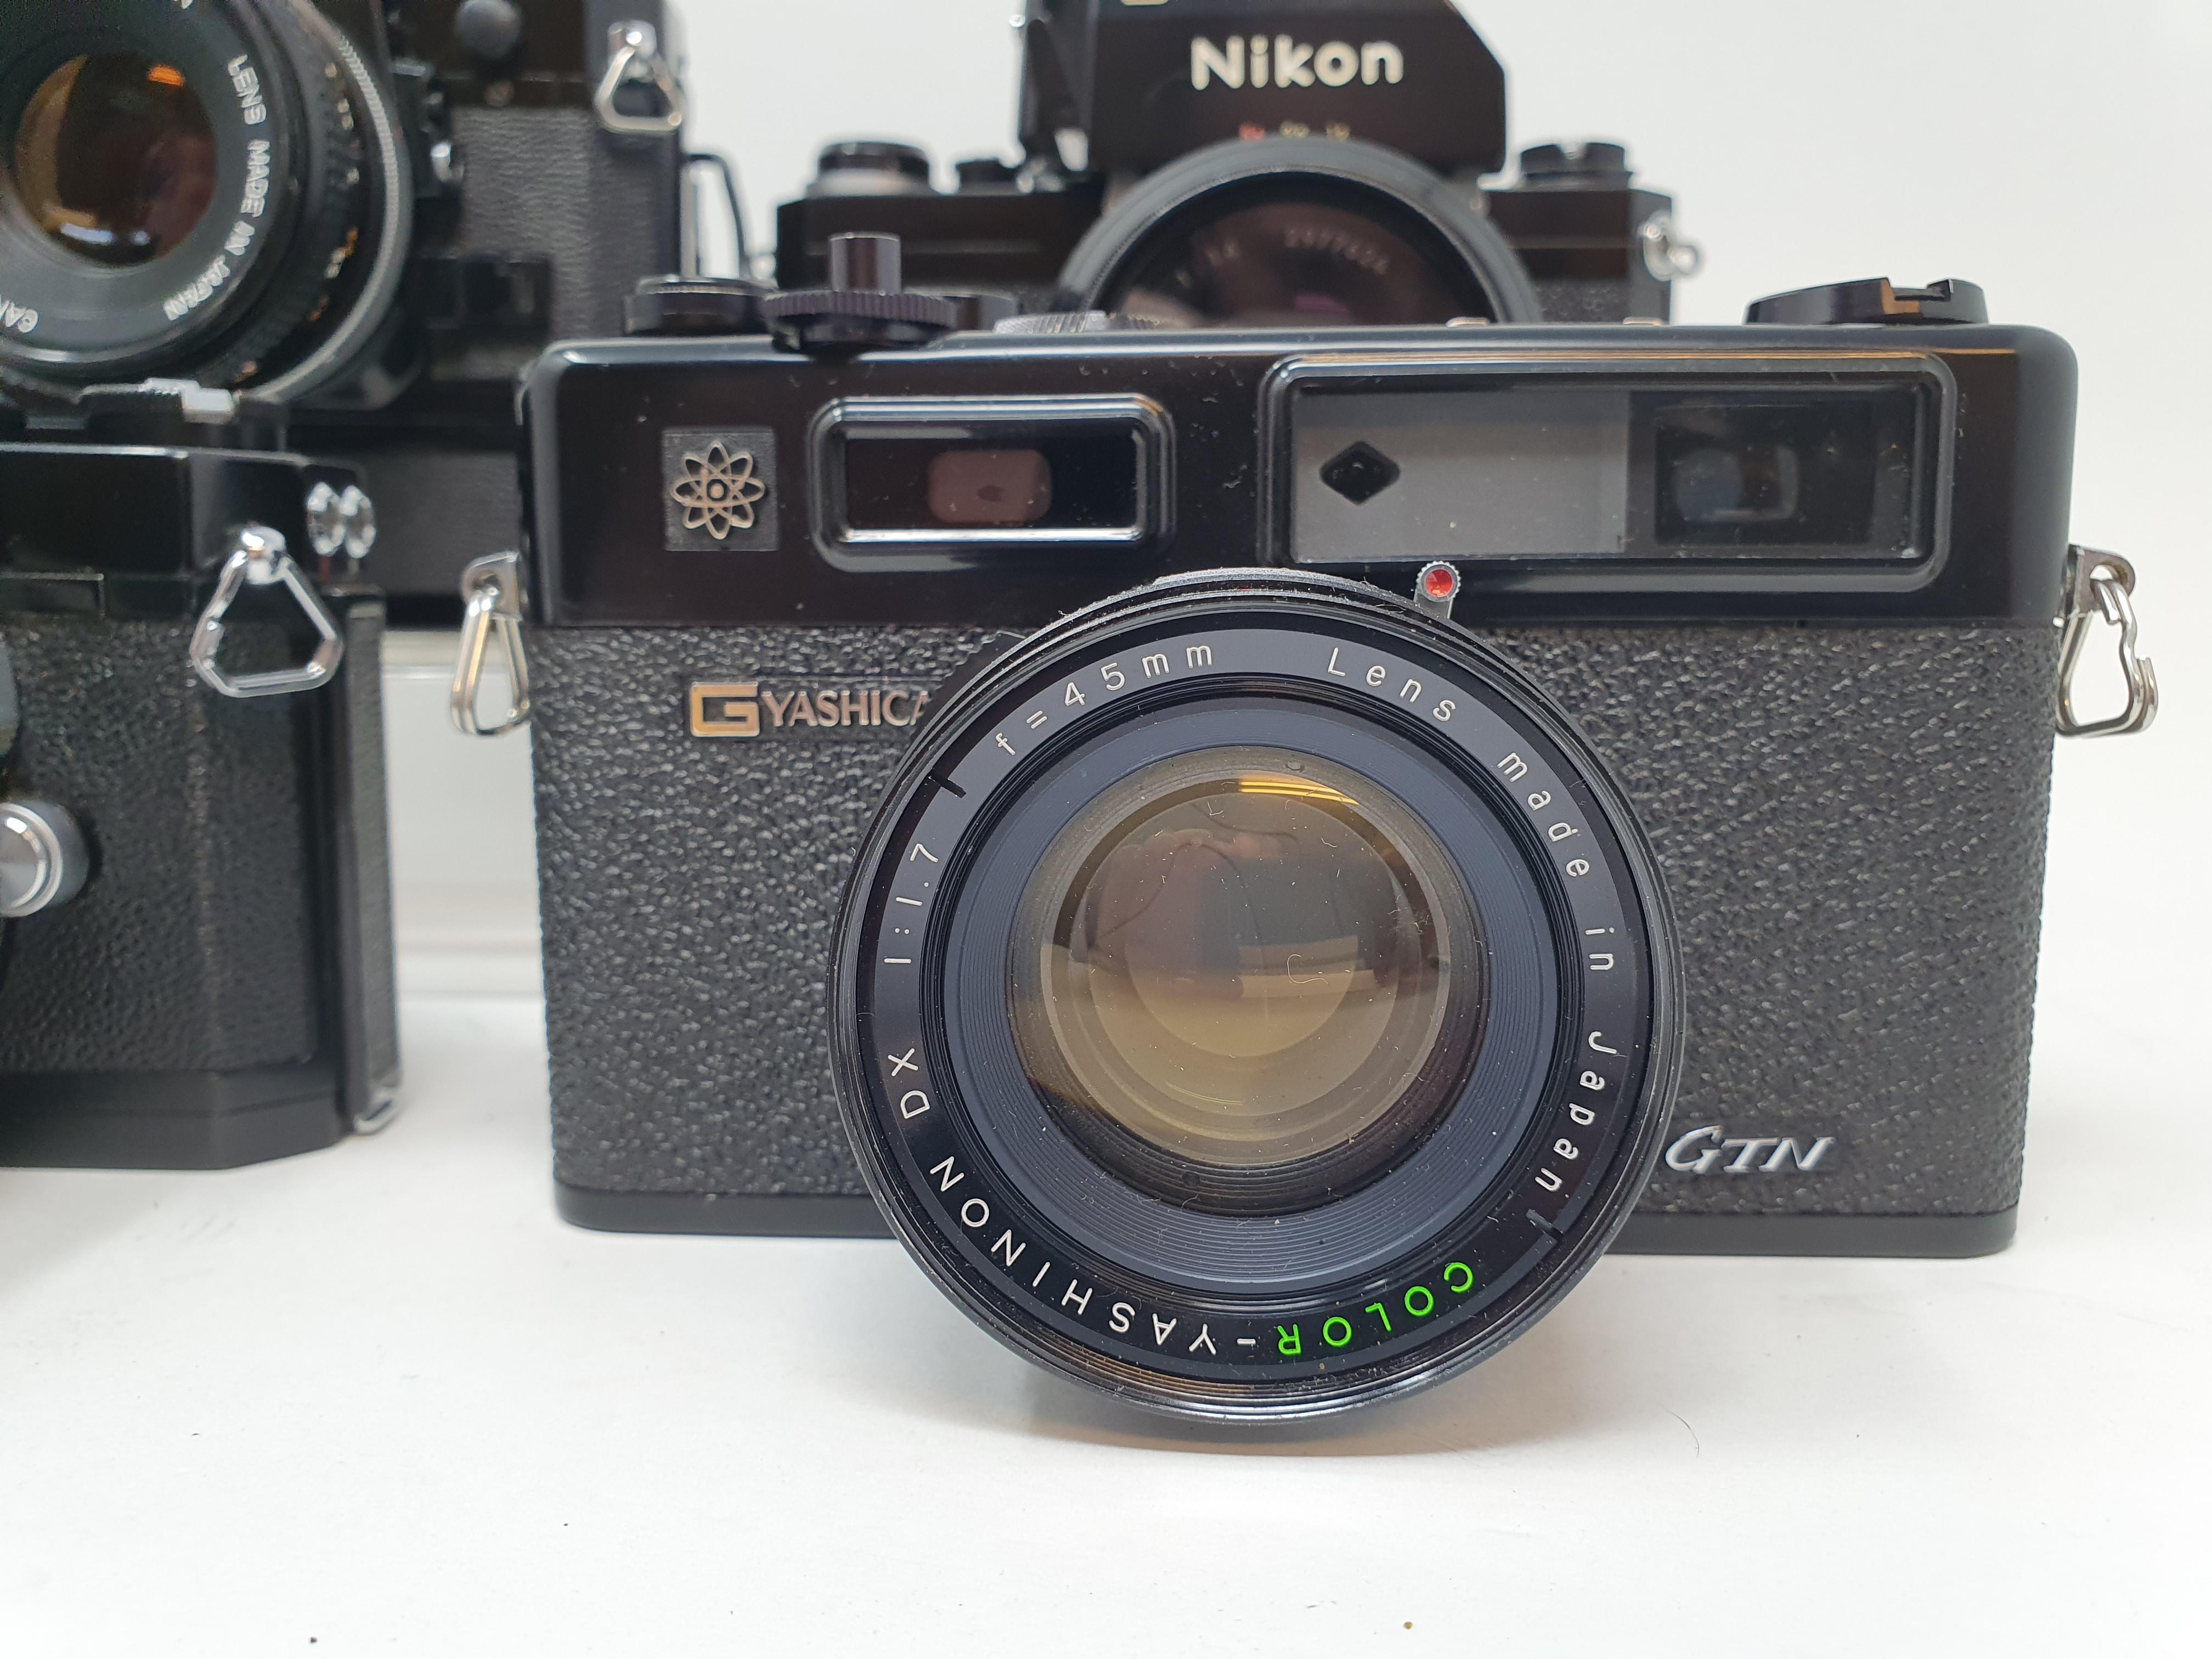 A Nikon F camera, with outer case, a Yashica GTN camera, a Canon A-1 camera, and a Nikkormat Nikon - Image 3 of 6